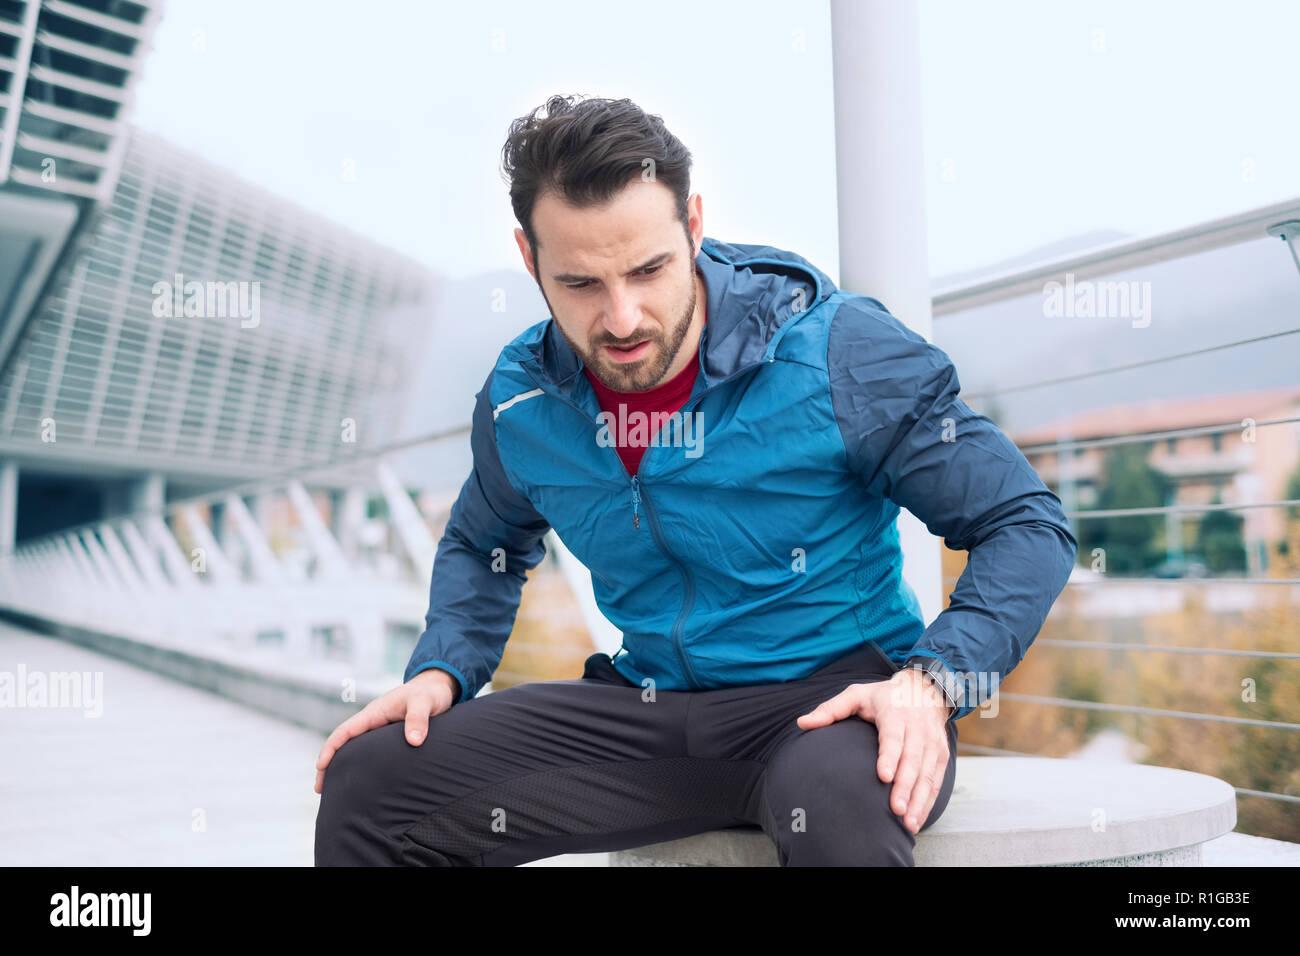 Active man resting during urban running training - Stock Image